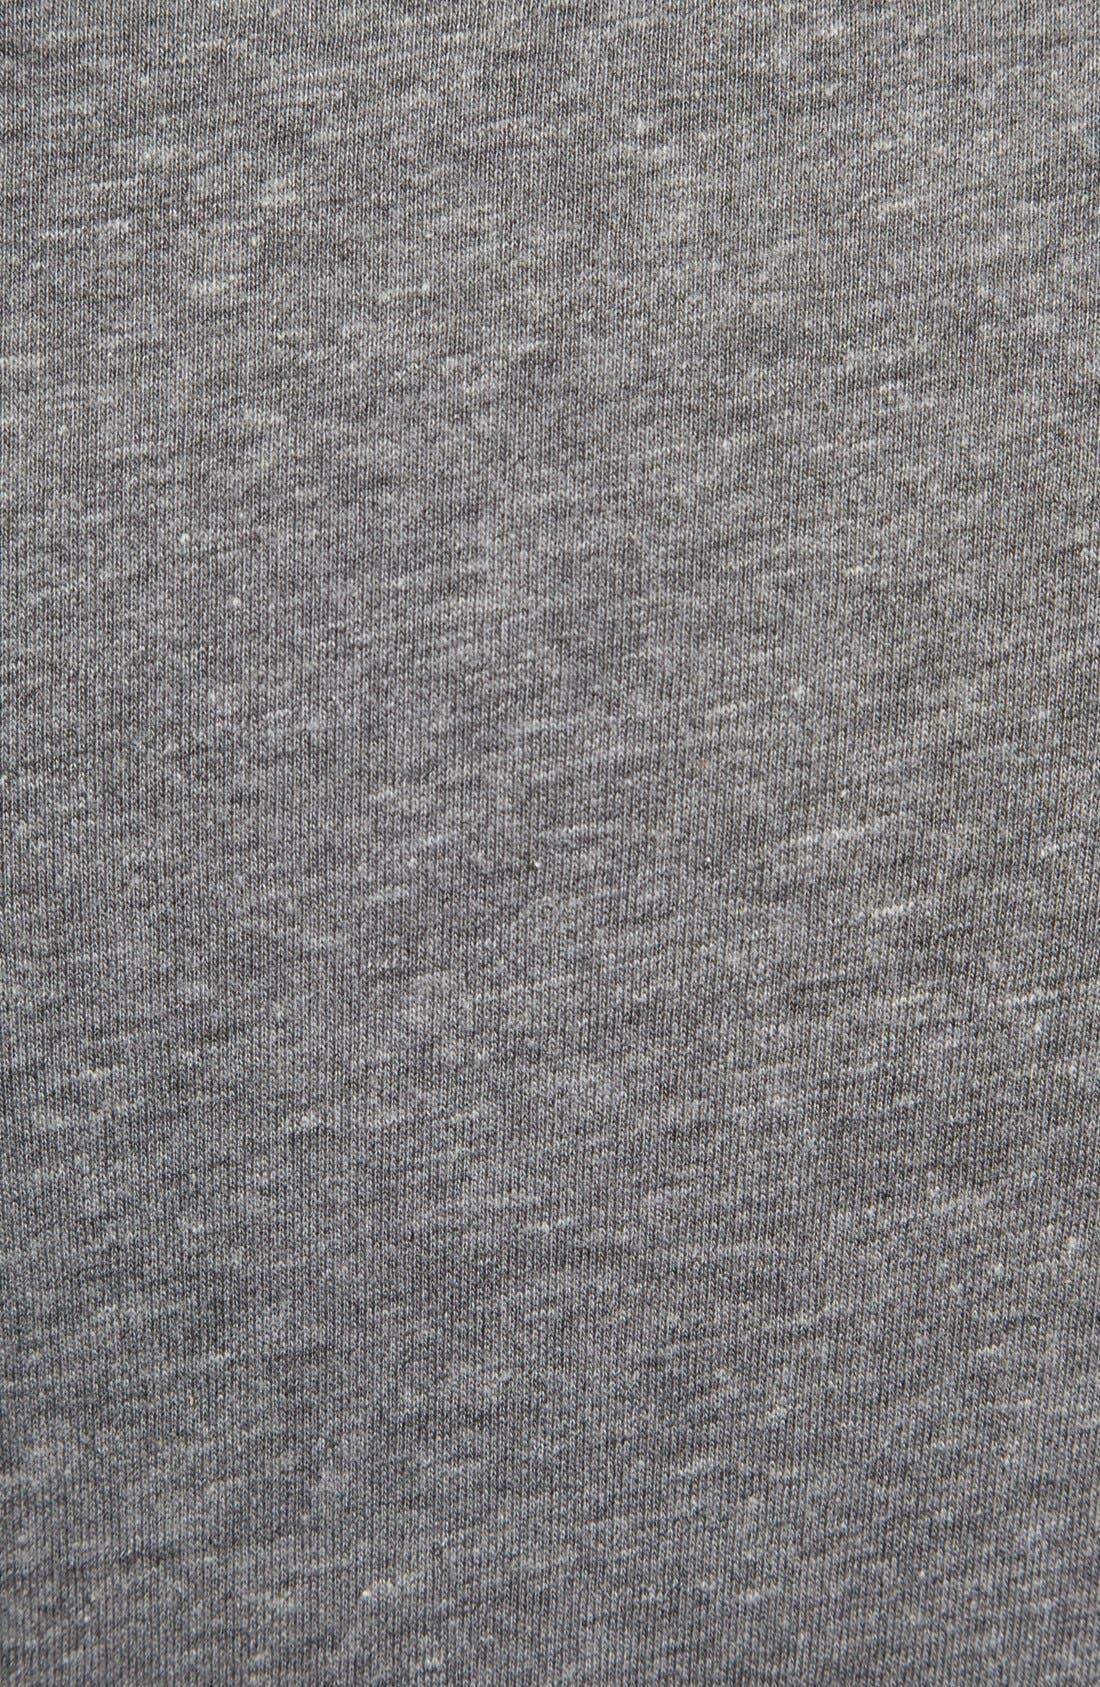 Alternate Image 3  - Original Penguin 'Mosaic Bird' T-Shirt